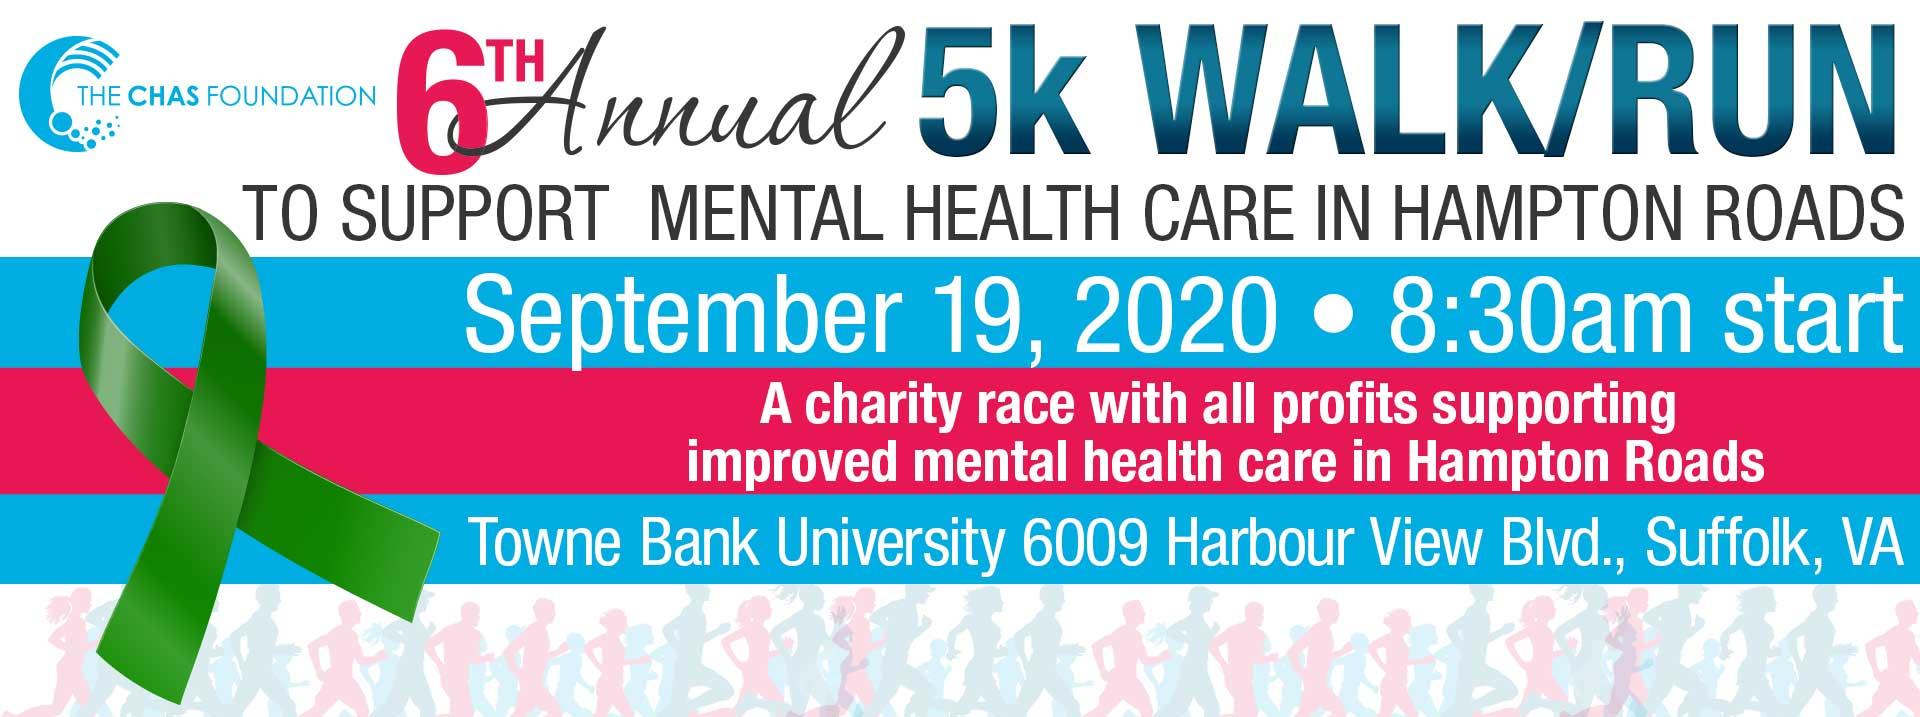 6th Annual Chas Foundation 5K Walk/Run